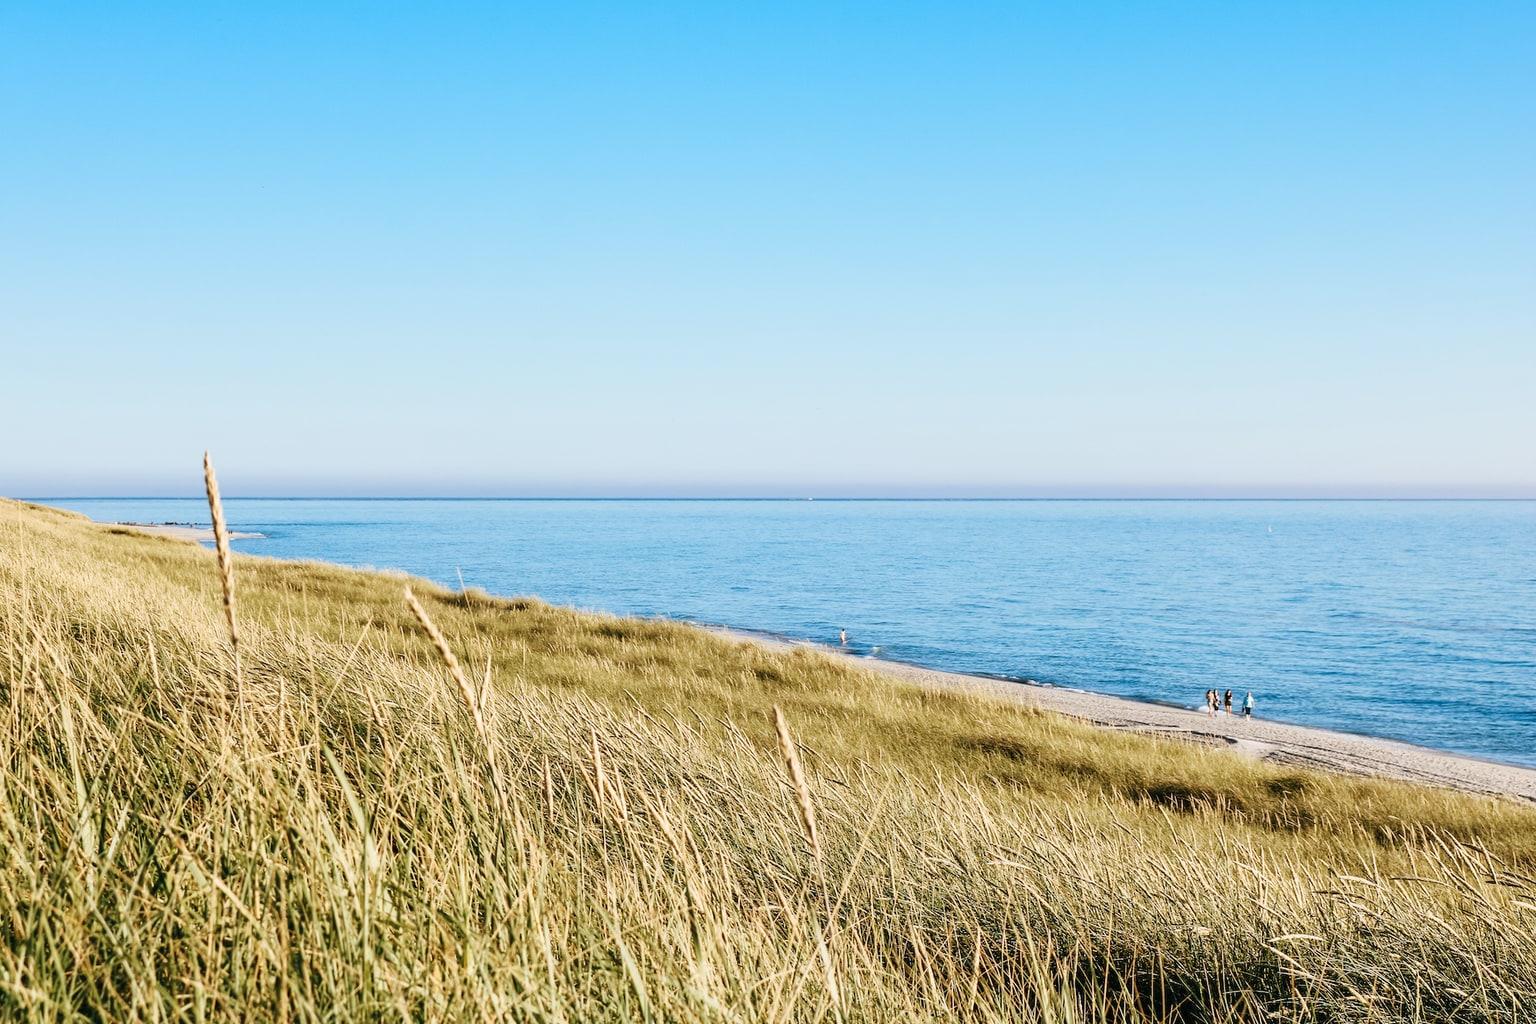 Avondstemming aan het strand van Hörnum op het eiland Sylt